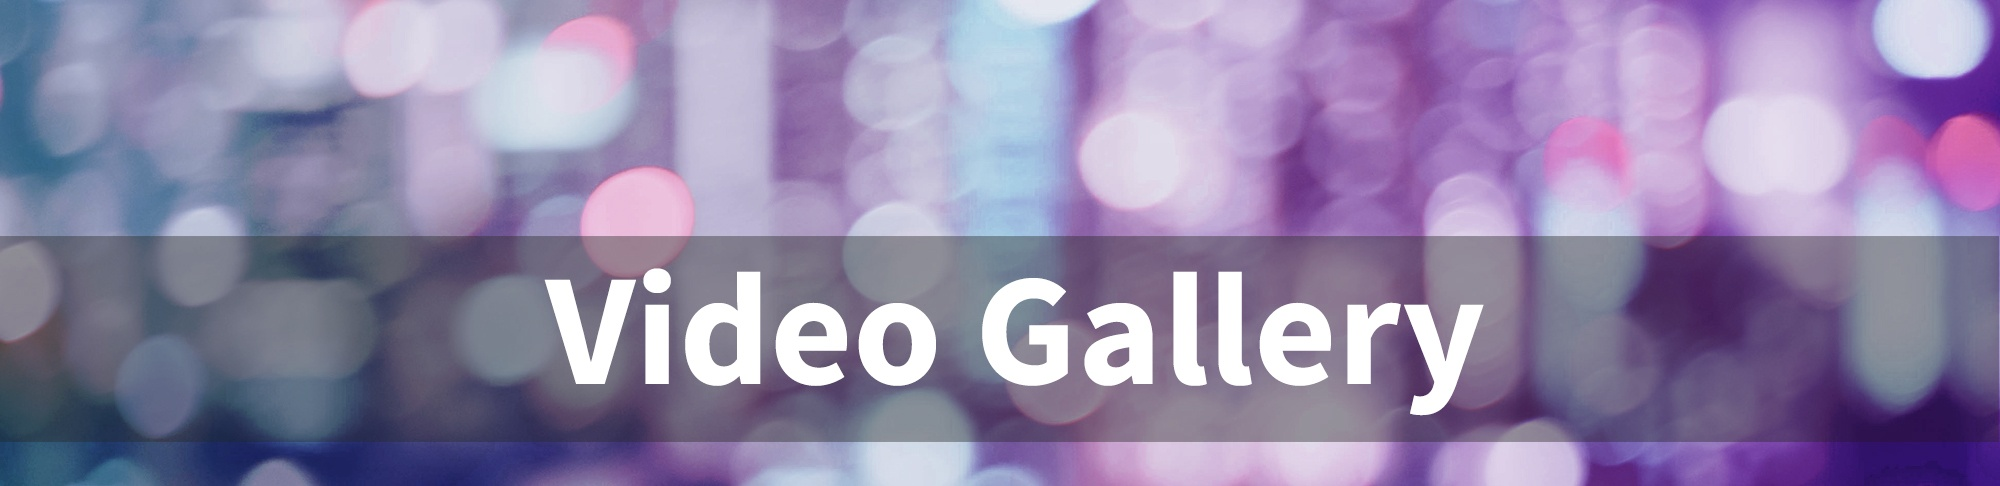 videogallery.jpg